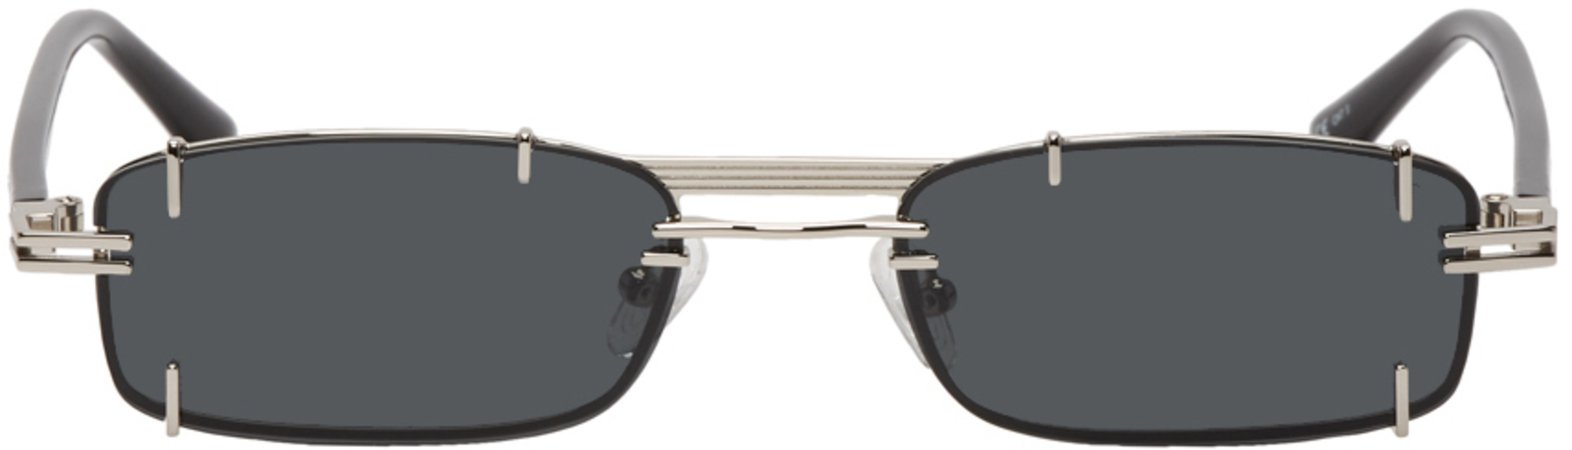 Y/Project: Silver & Black Linda Farrow Edition Neo Sunglasses   SSENSE